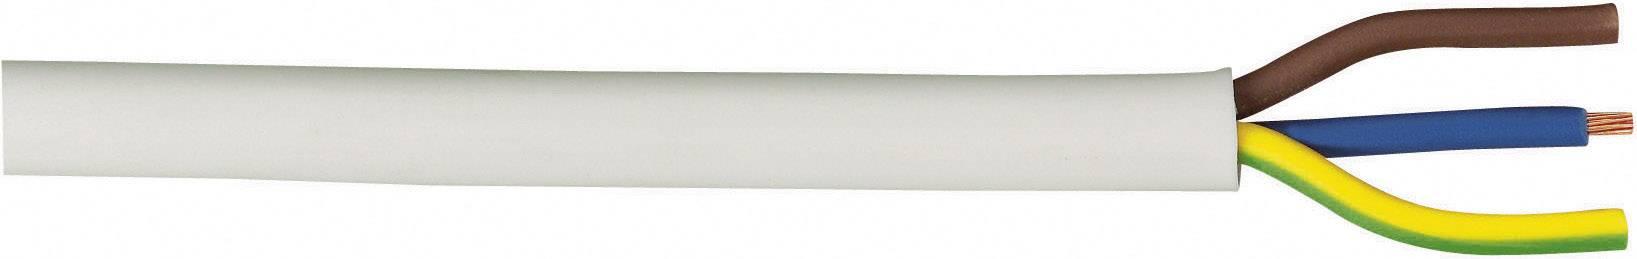 El. kábel hadicový H05VV-F LappKabel 49900078, 3 G 1.50 mm², biela, 20 m